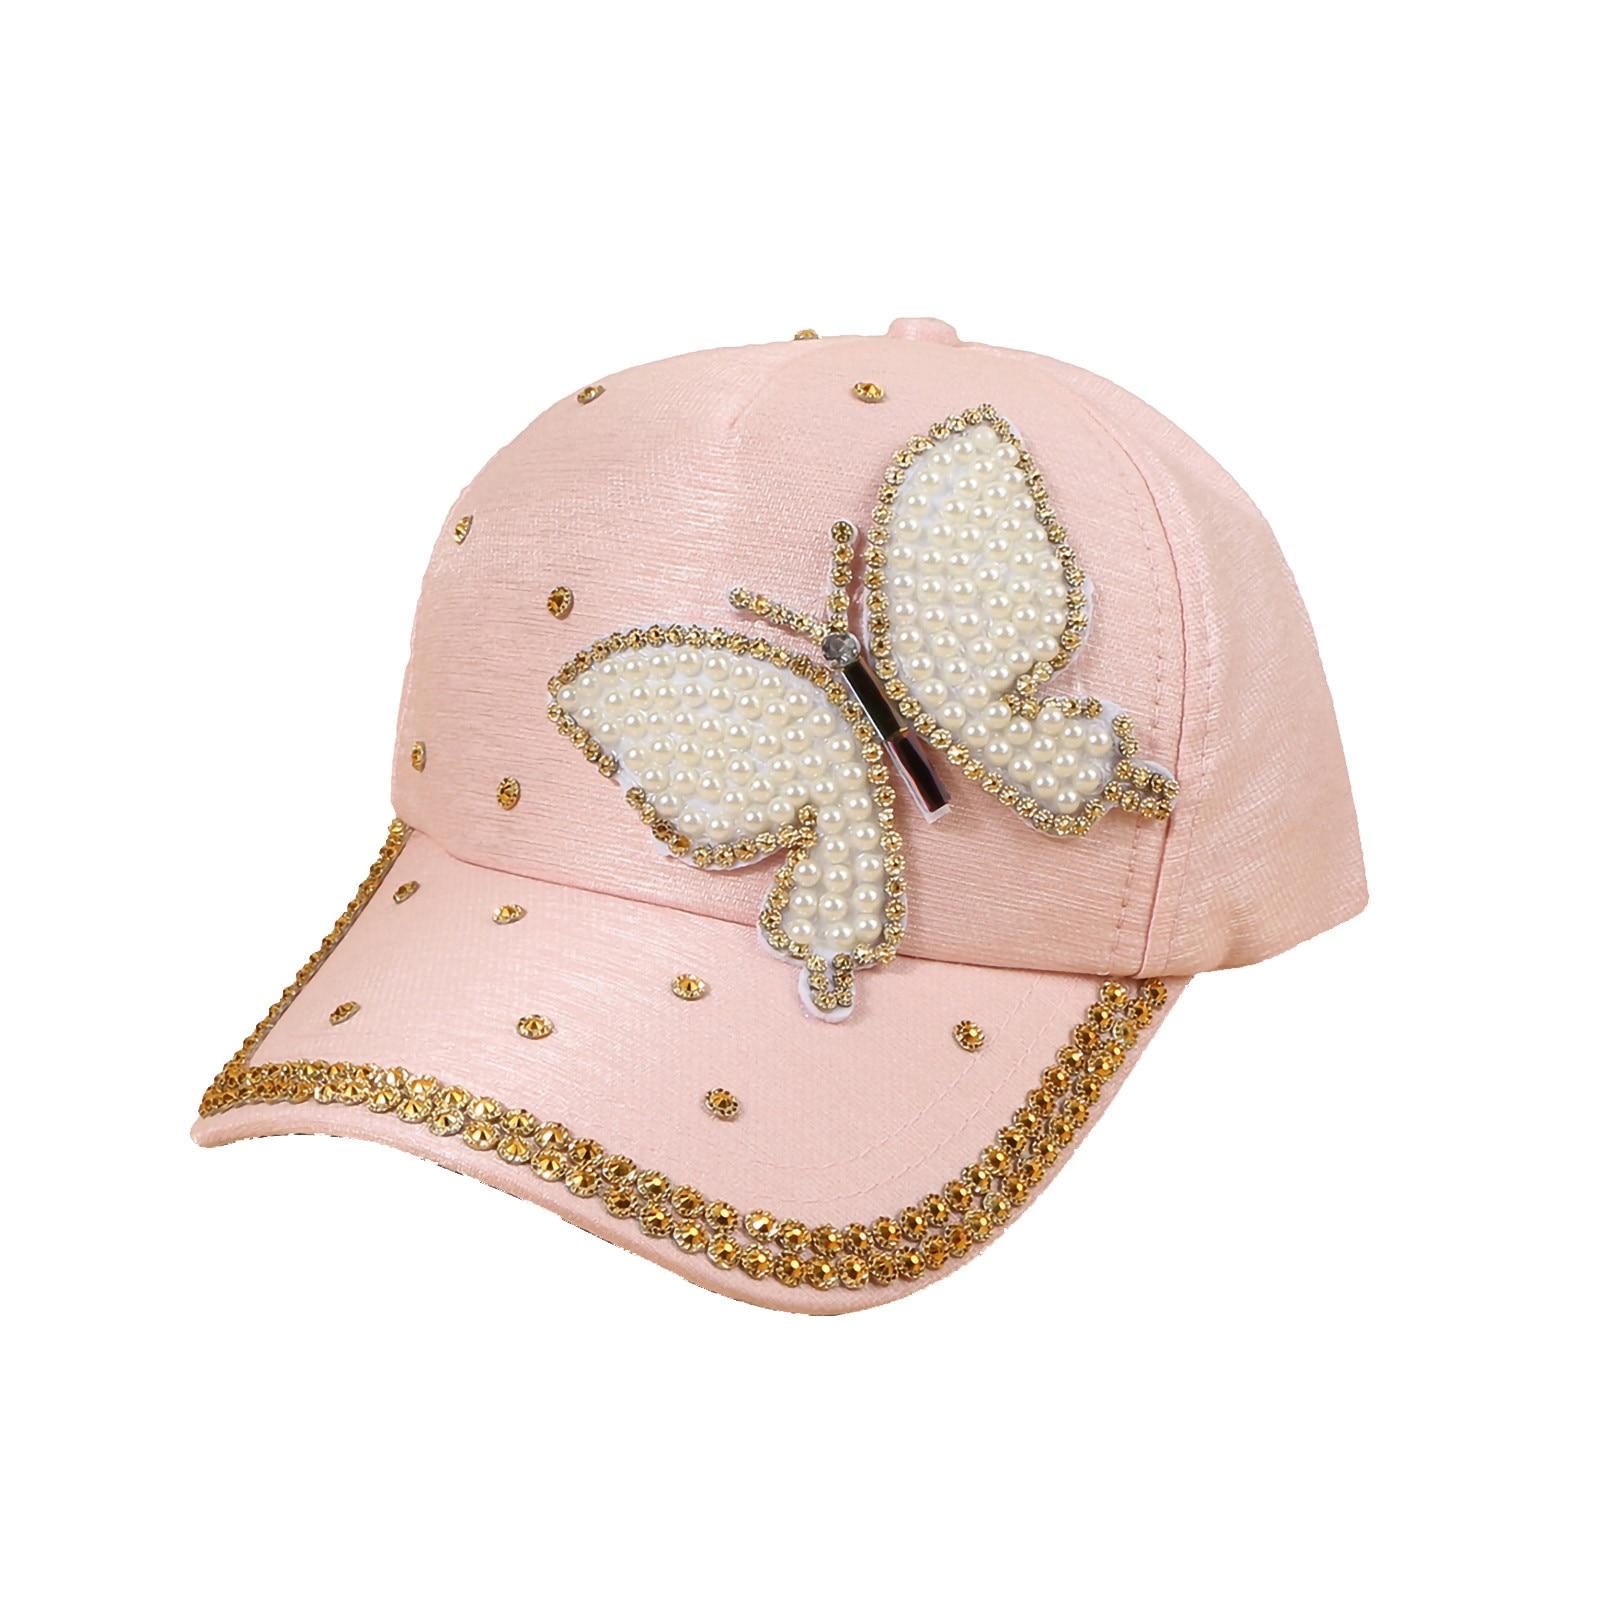 Children's cap Baseball Hat beach hat Sequined Butterfly for Toddler Baby Kids Boys Girls  Shading Women's cap hat baby girl